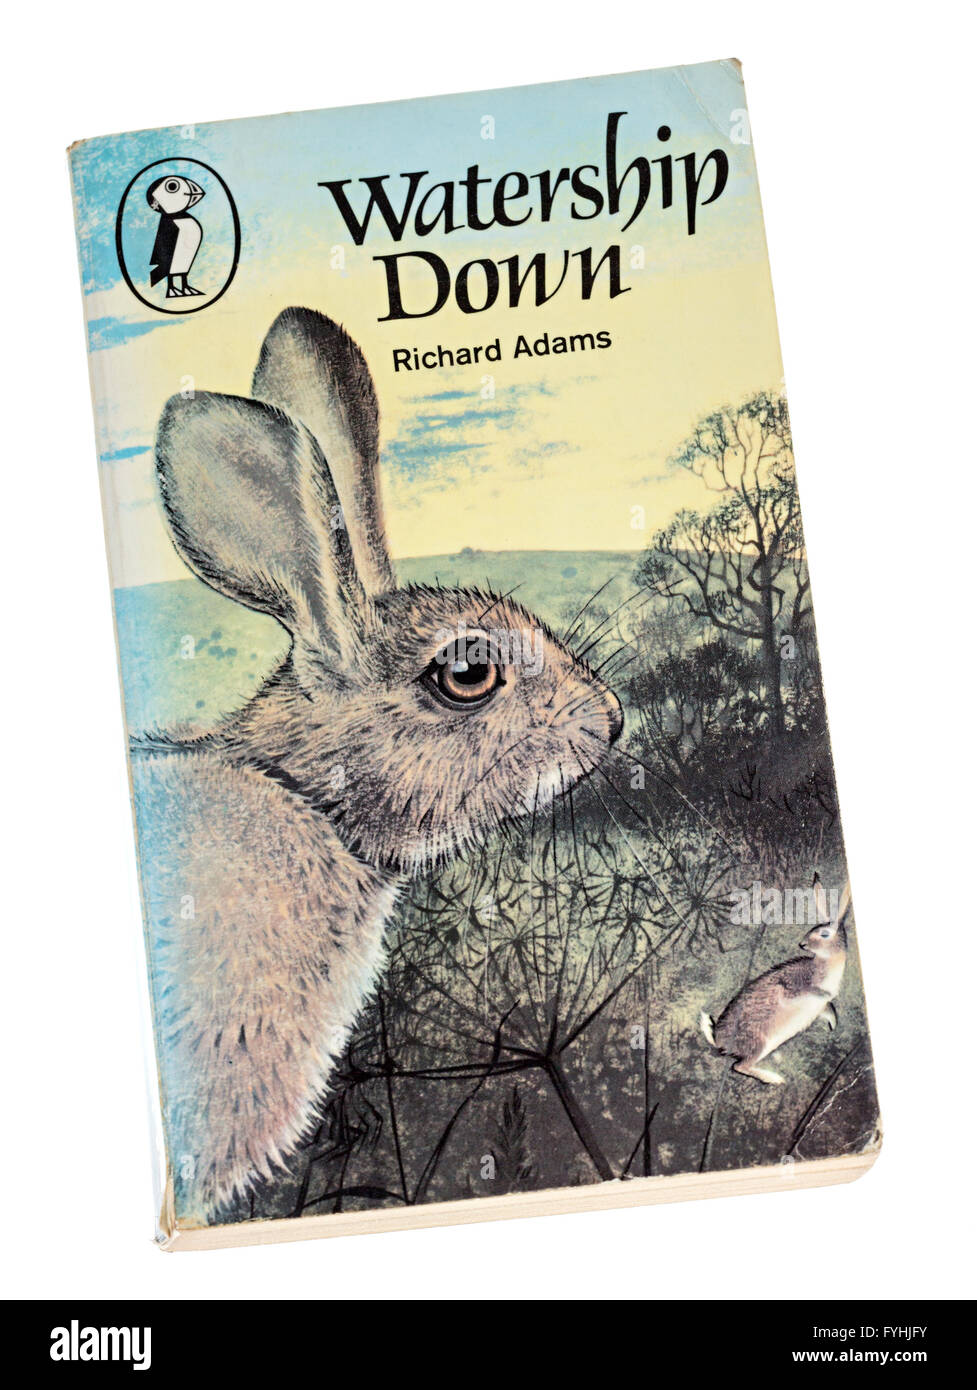 Richard Adams Watership Down libro in brossura copertina Immagini Stock